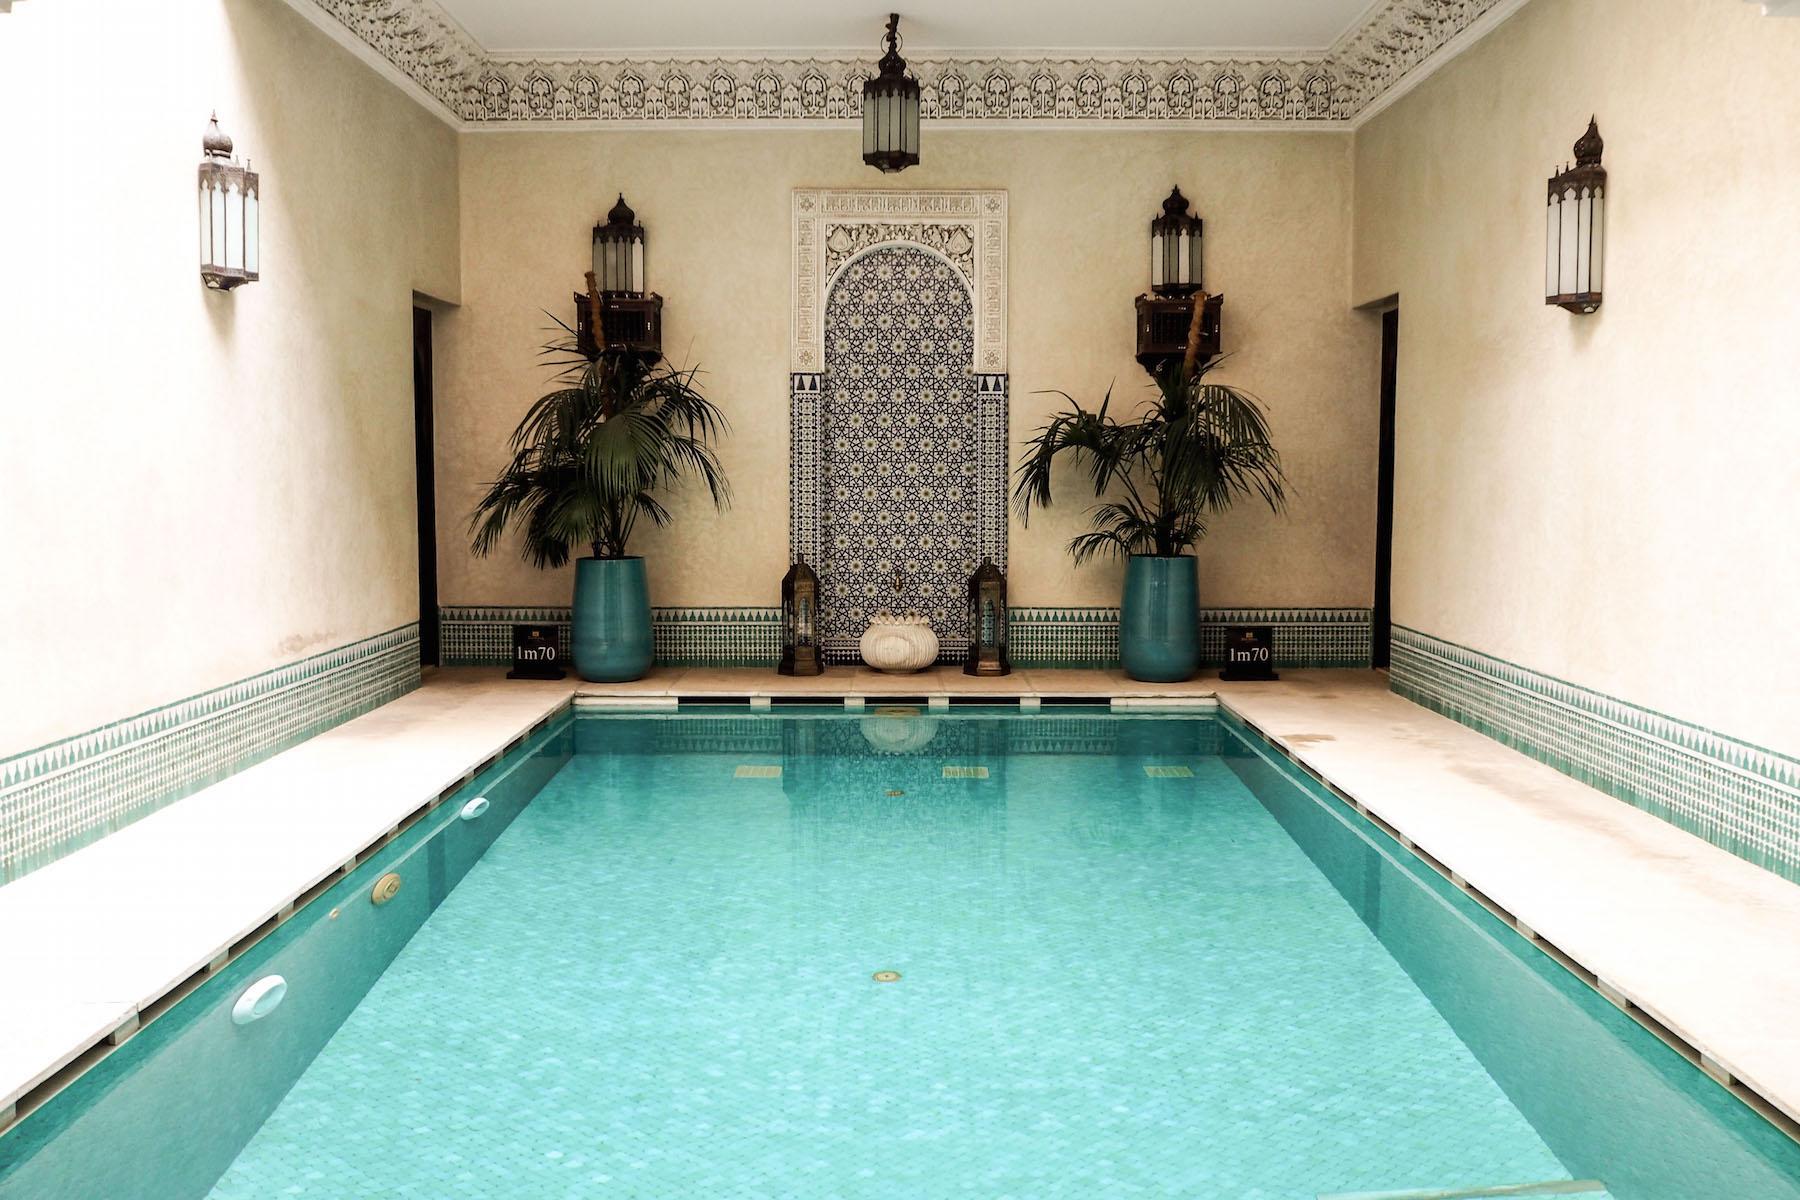 The pool at Riad Kniza, Marrakech